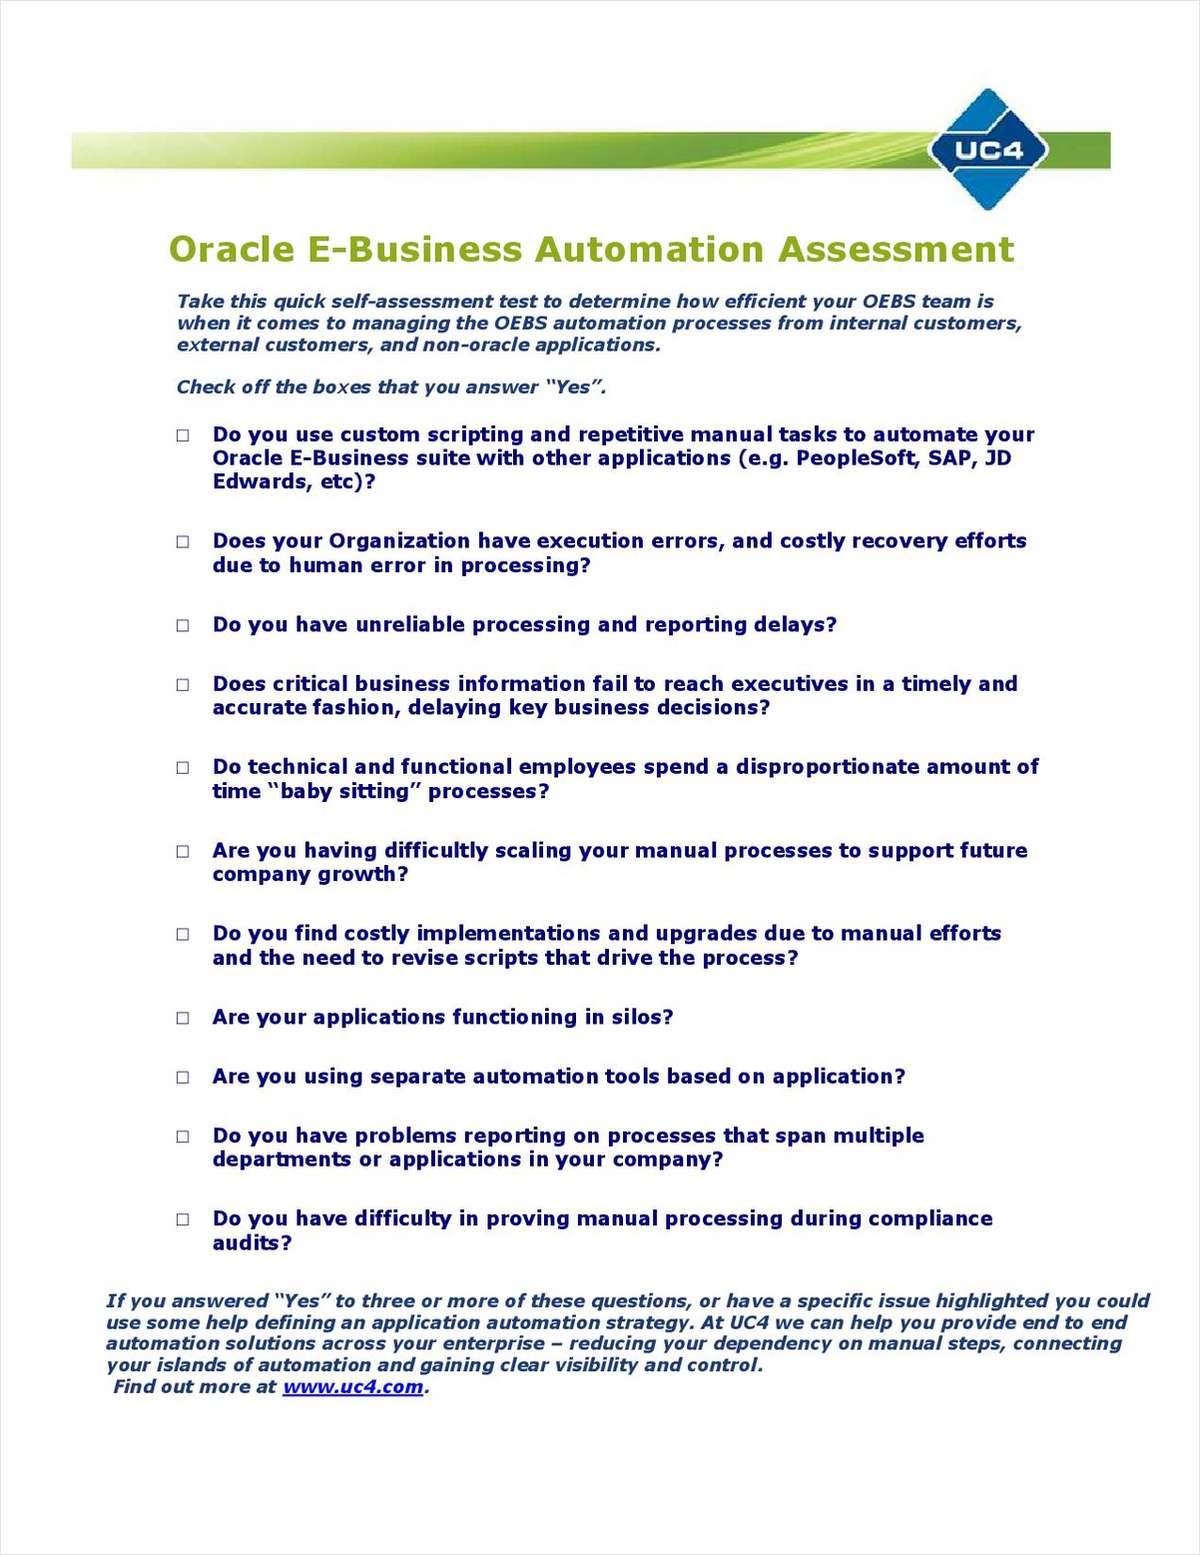 Oracle E-Business Suite Automation Kit Free eKit